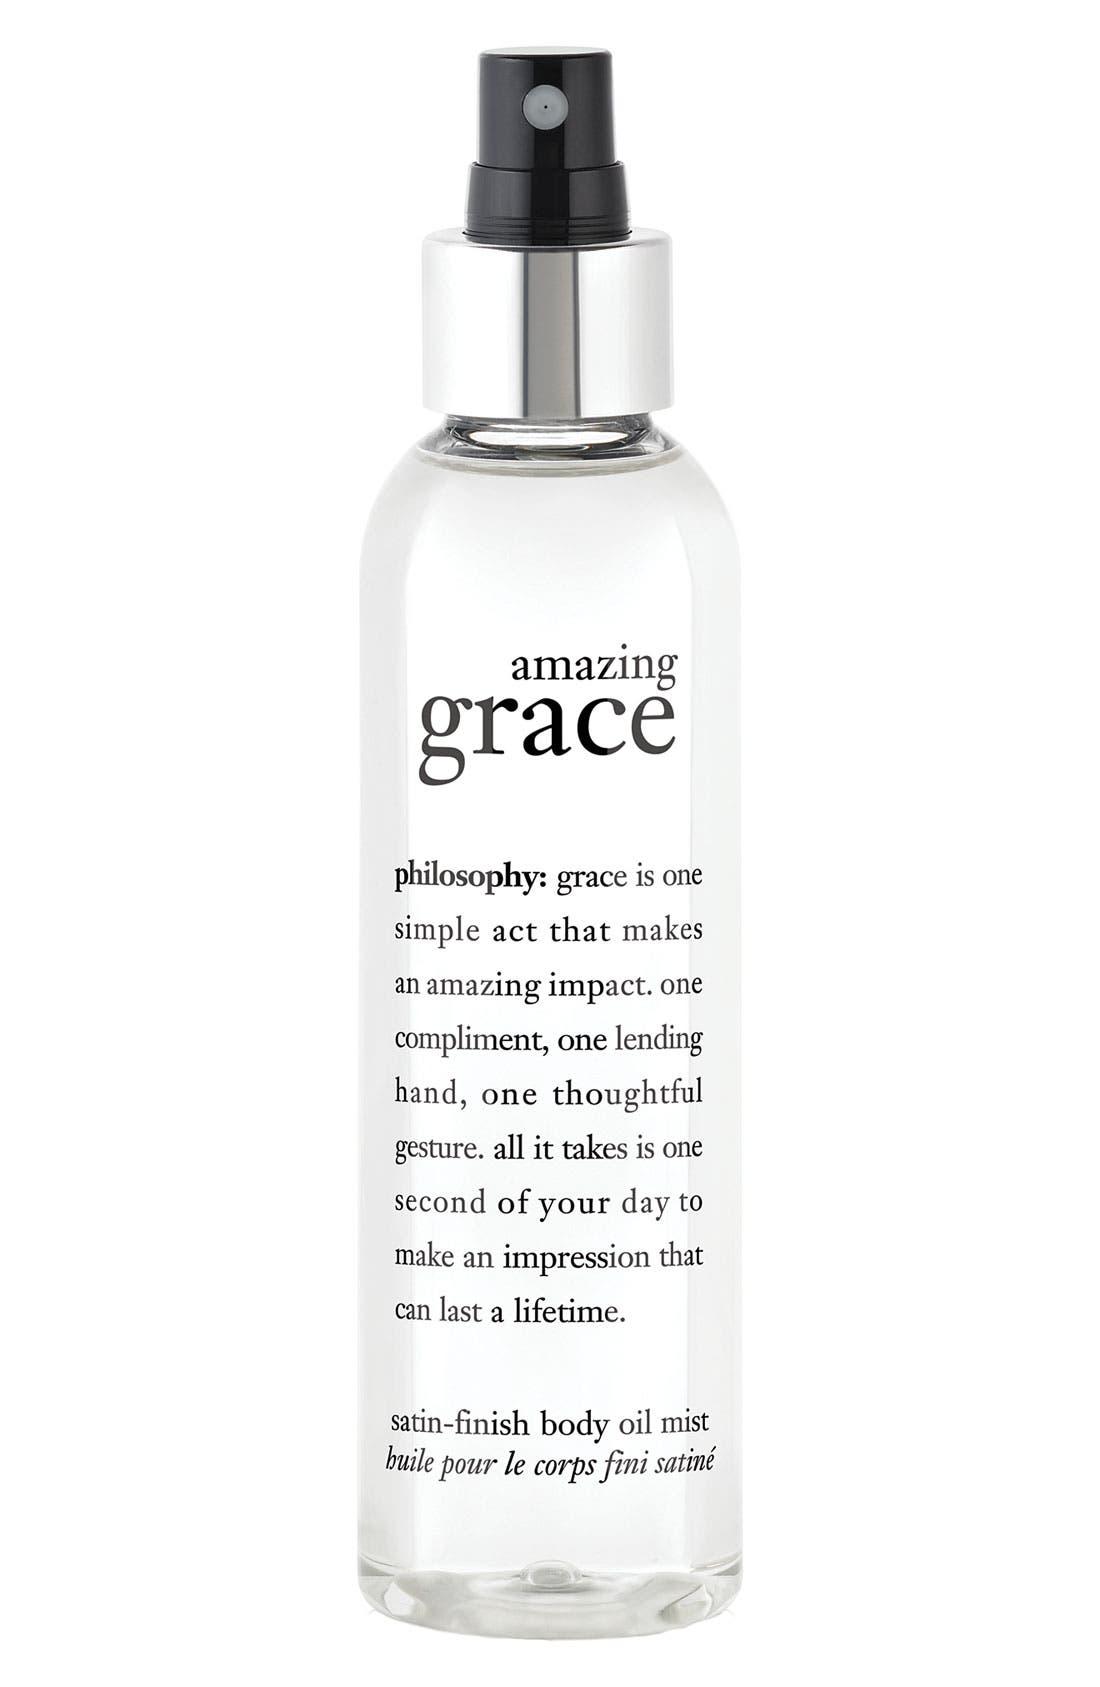 philosophy 'amazing grace' satin-finish body oil mist